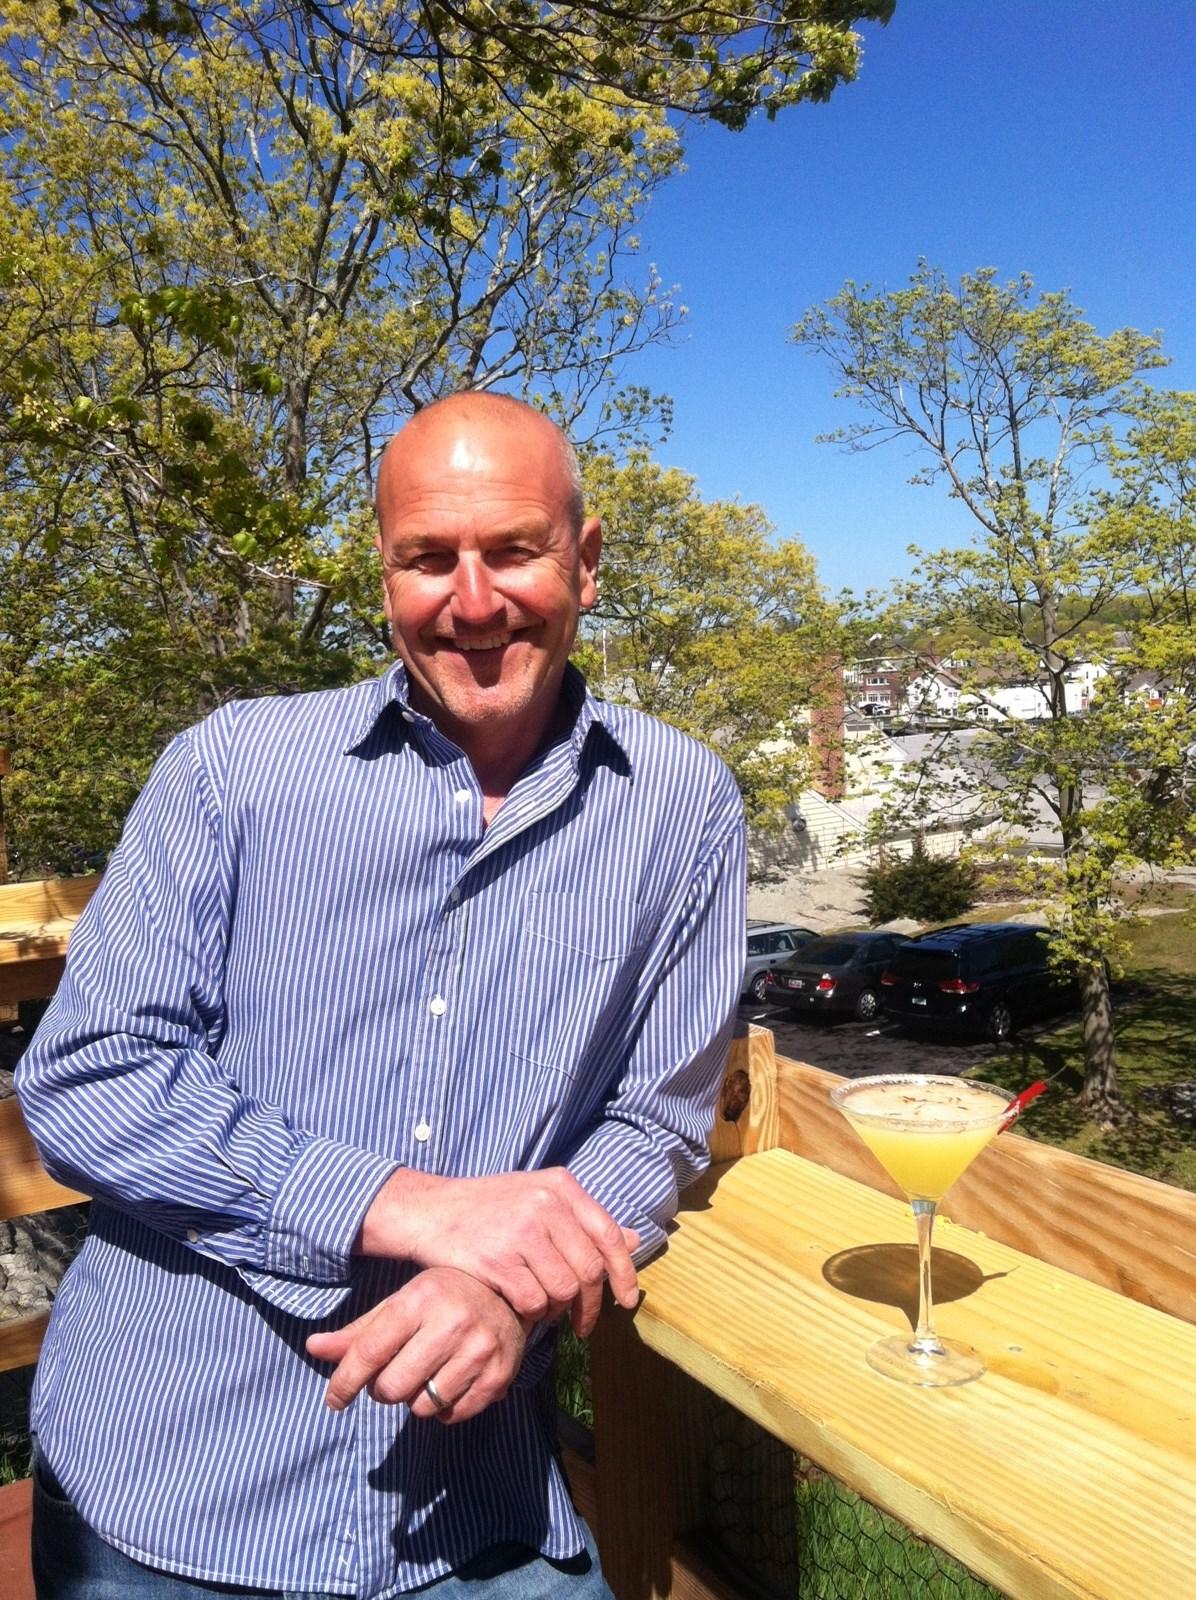 Serving Up: Oyster Club's Safflower Margarita